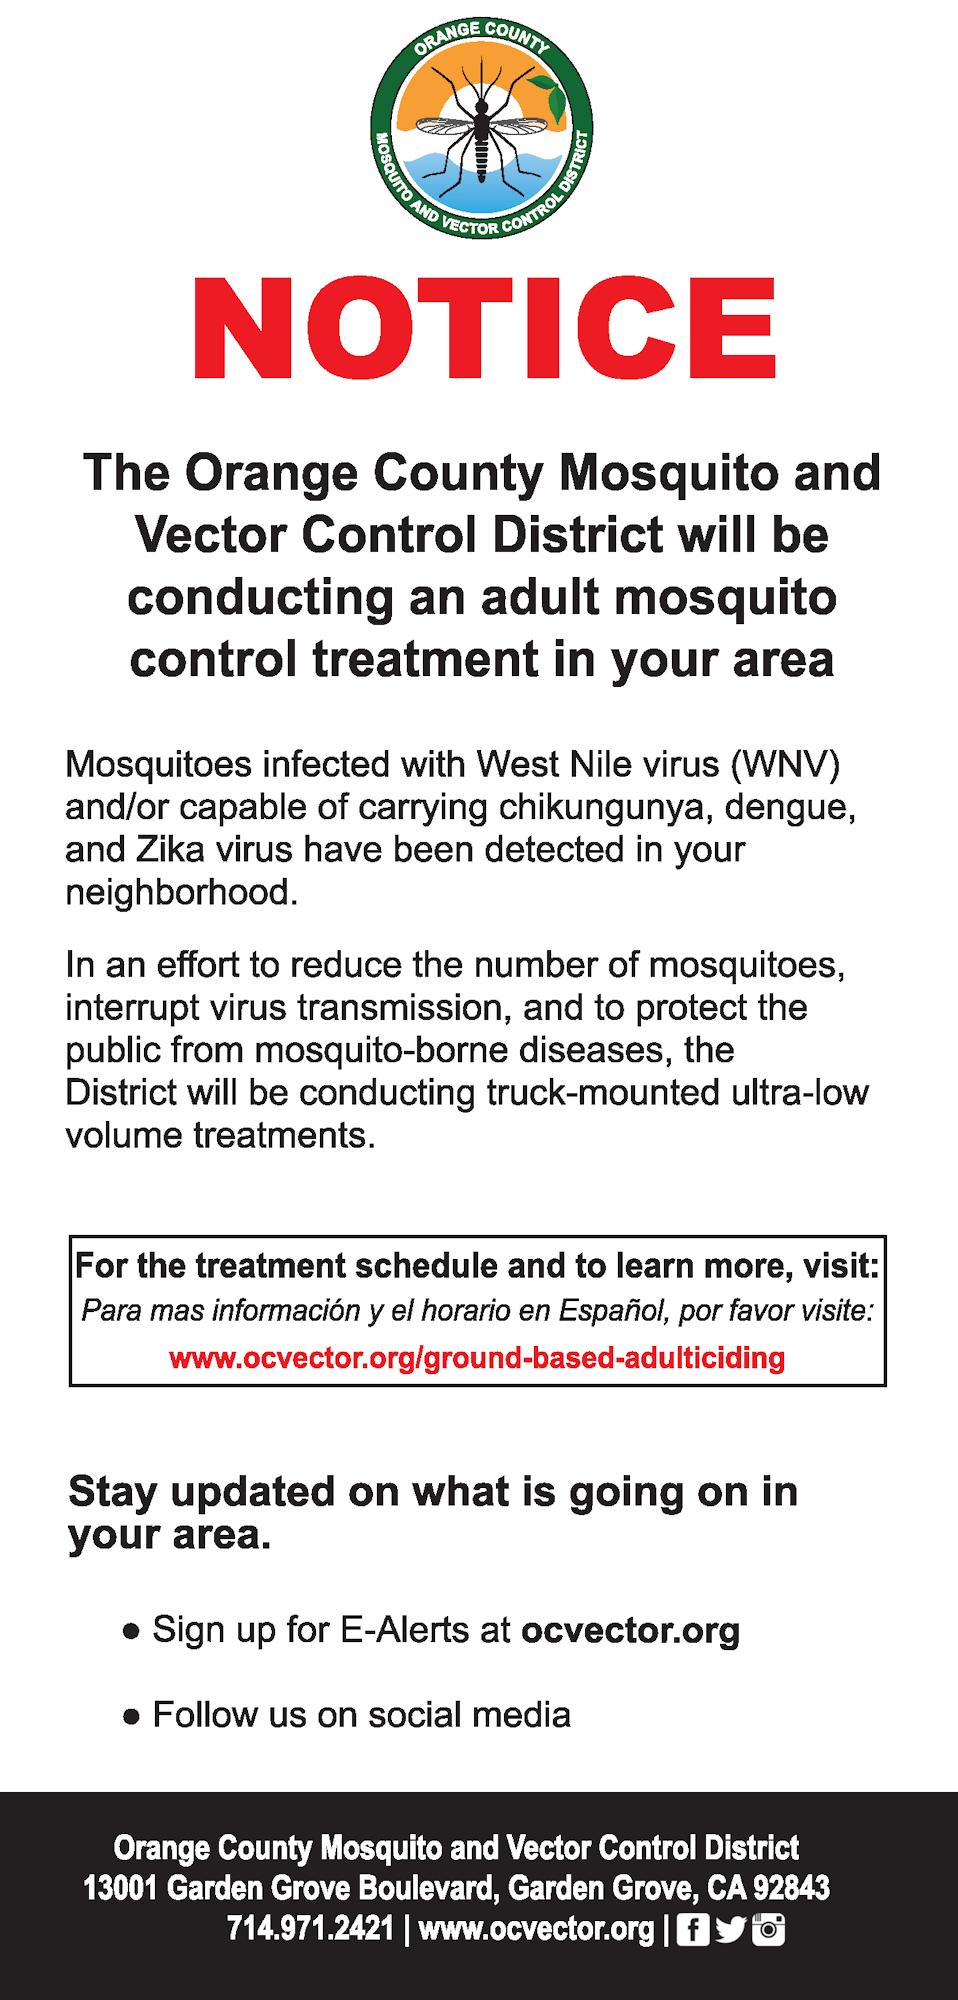 Door Hanger to Notify Residents of Adult Mosquito Control